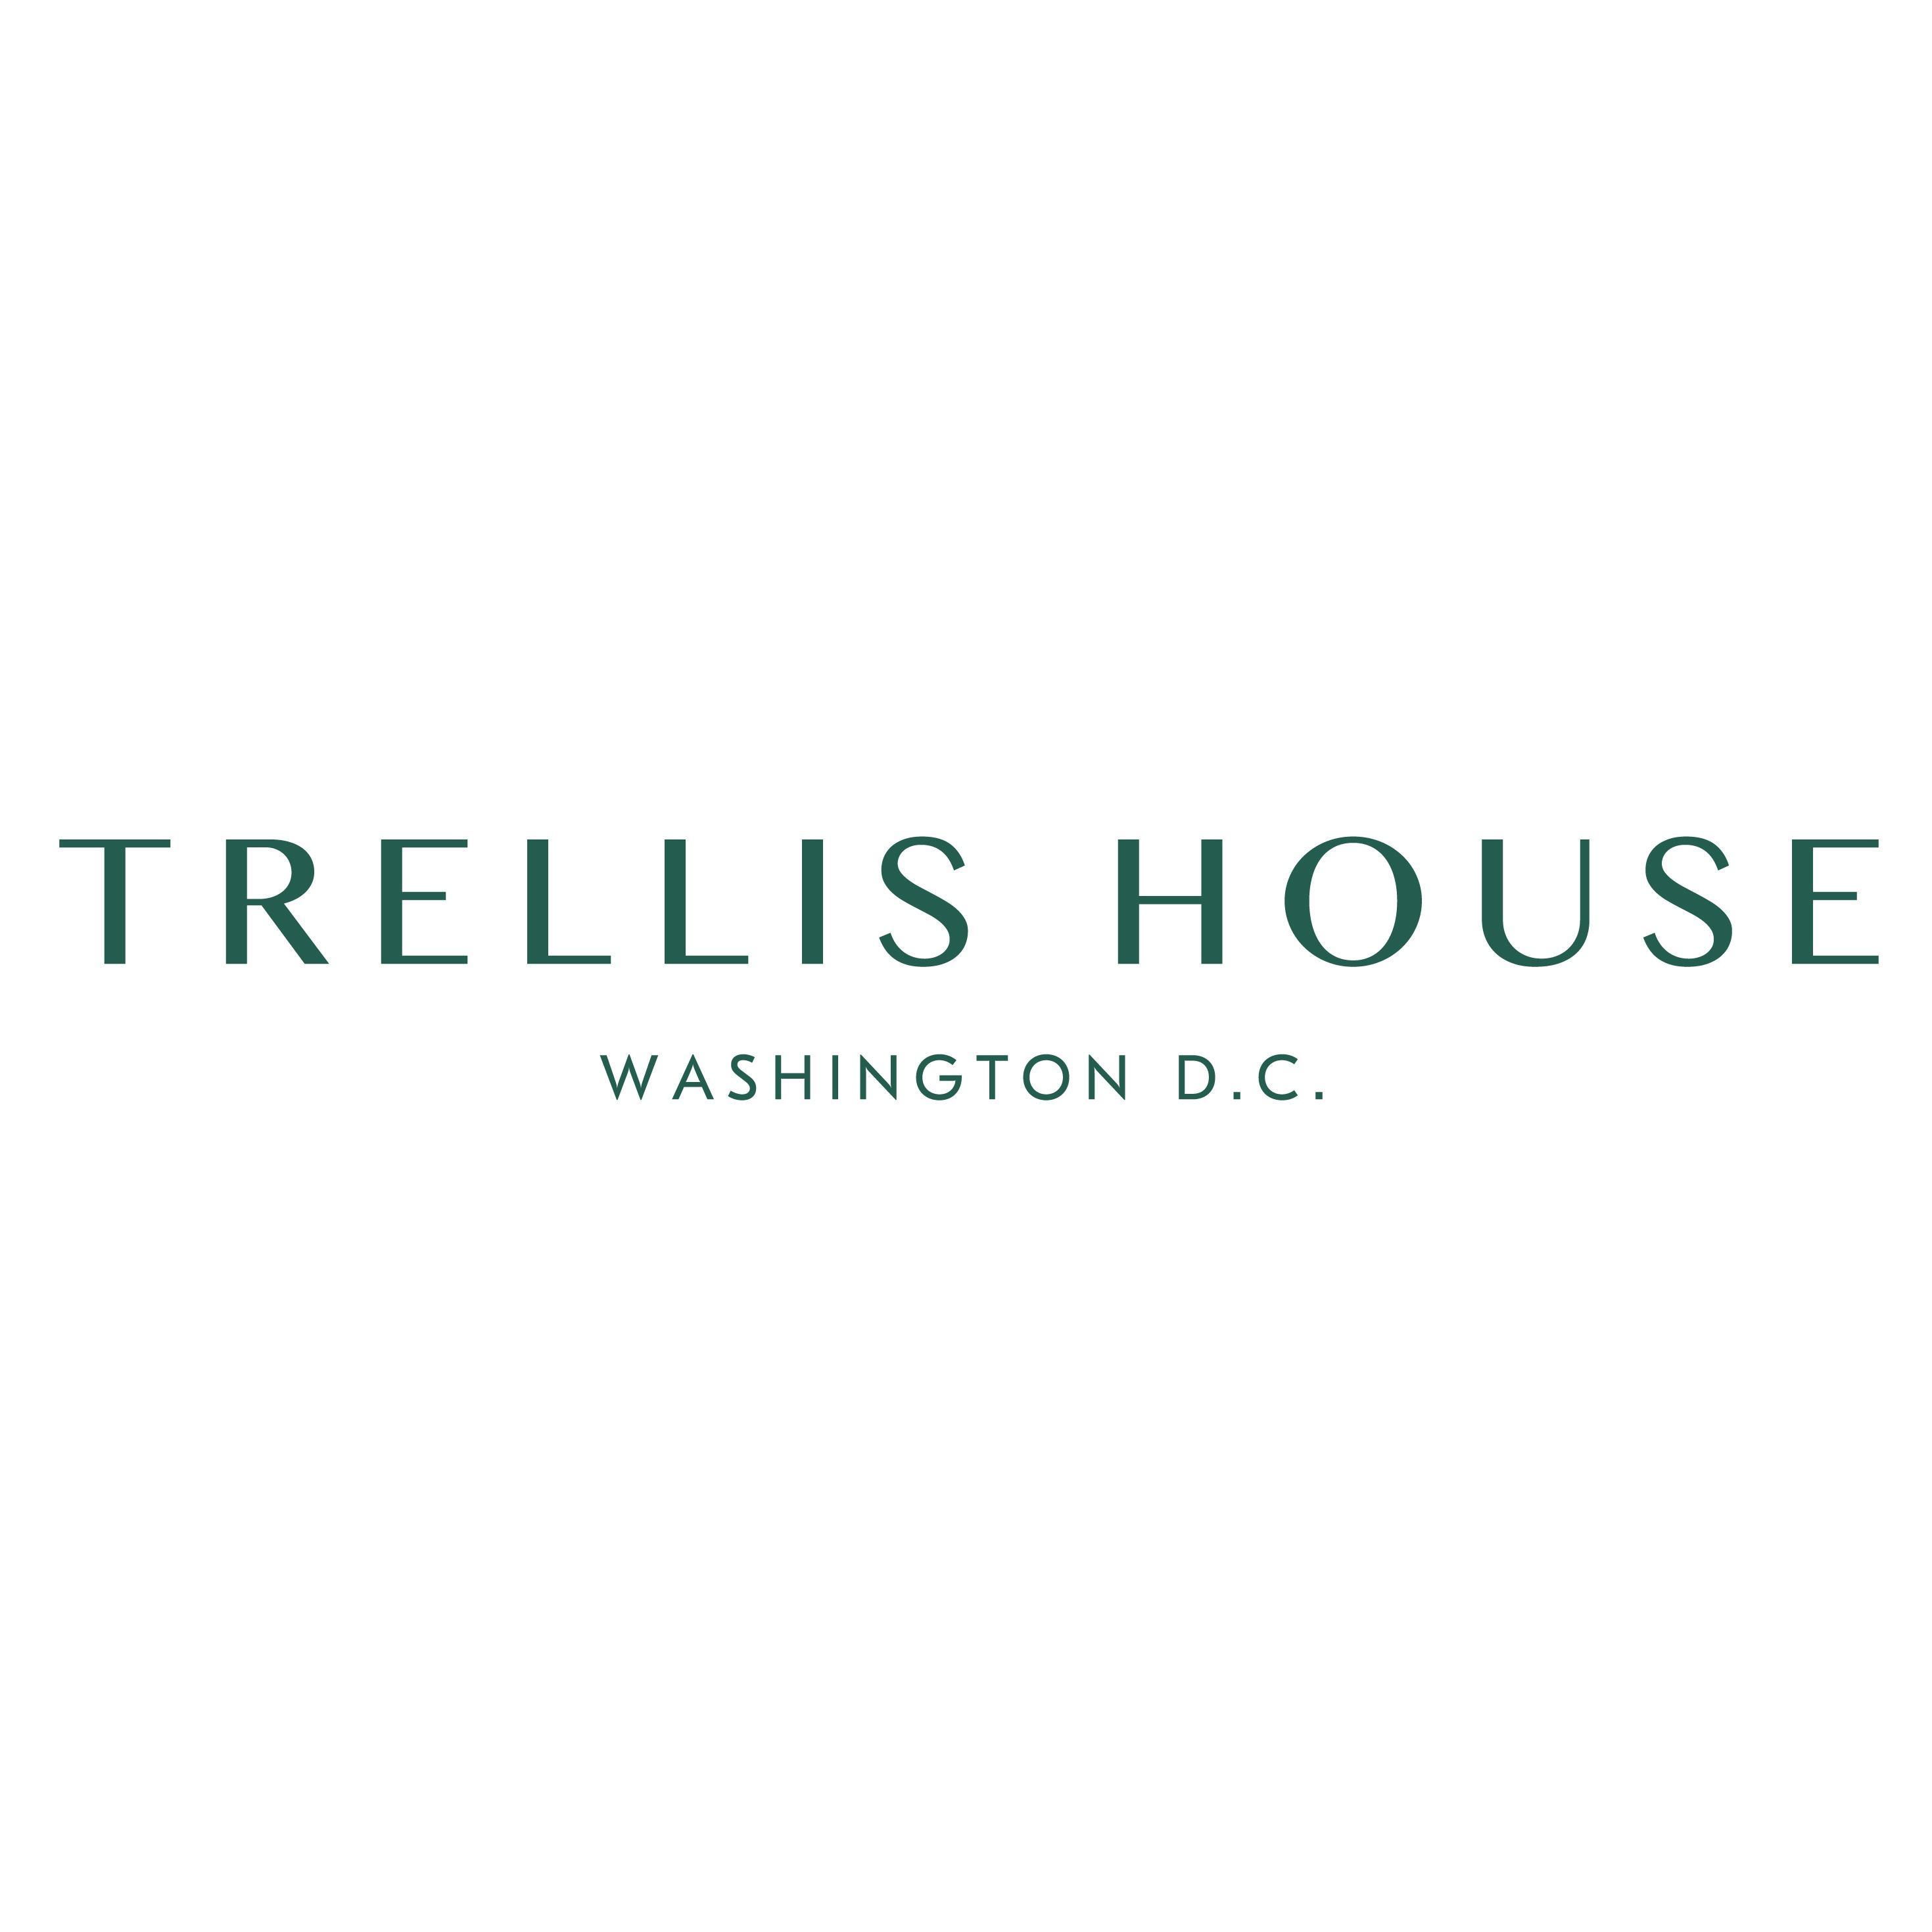 Trellis House